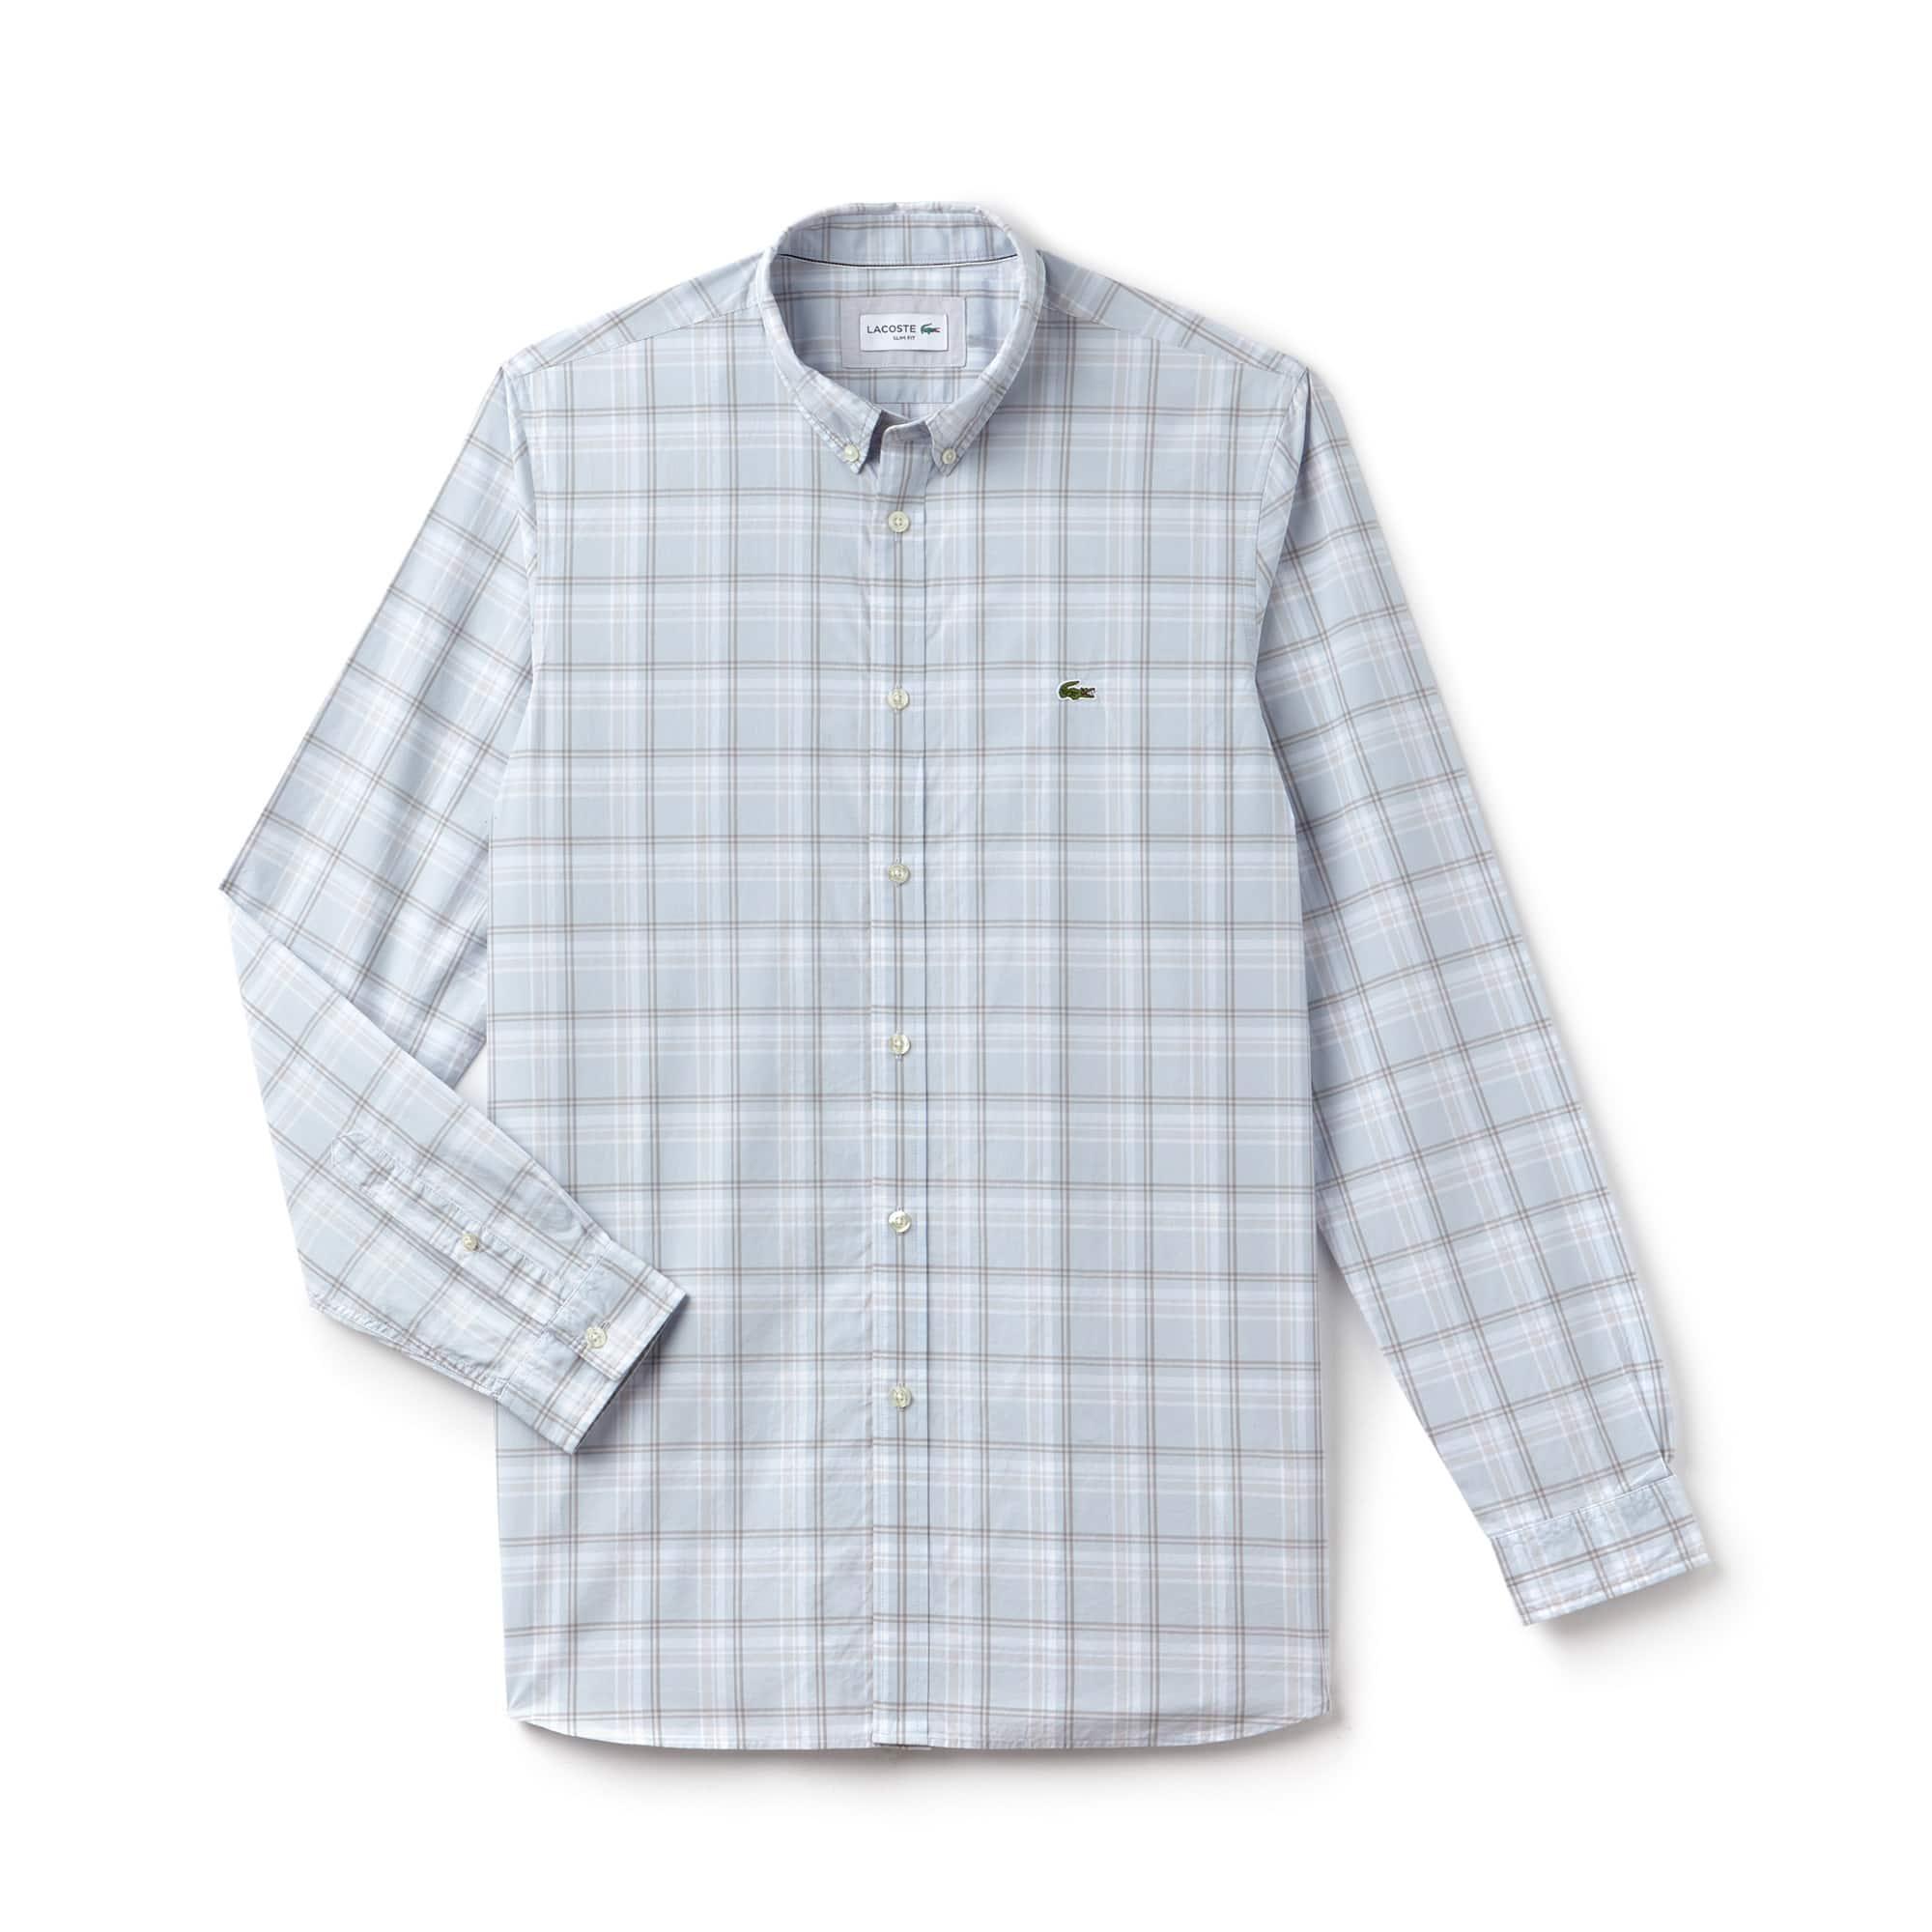 Shirt heren slim fit brede ruitjes stretch Katoenpopeline